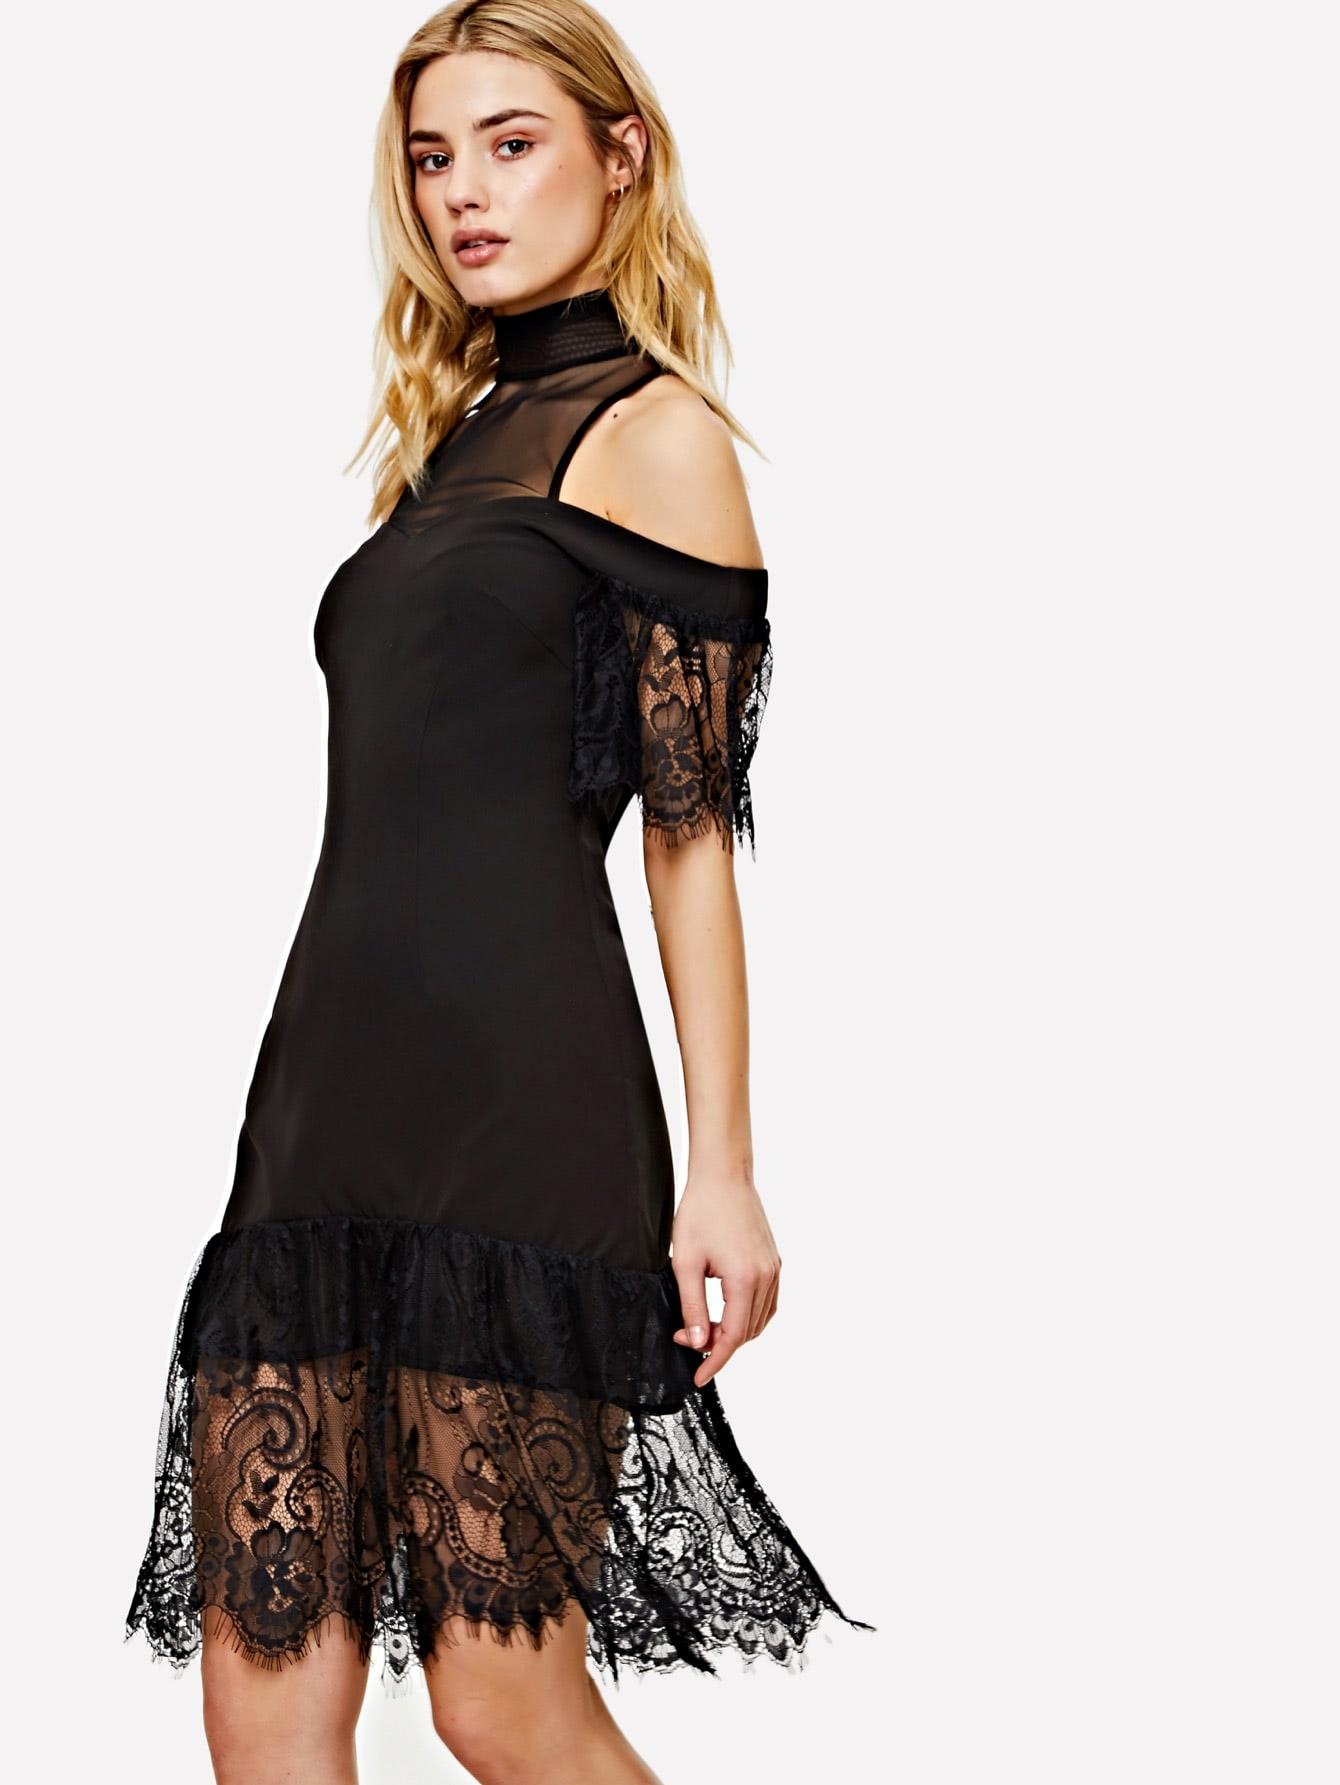 Mesh Yoke Cold Shoulder Lace Insert Dress lace yoke cold shoulder top